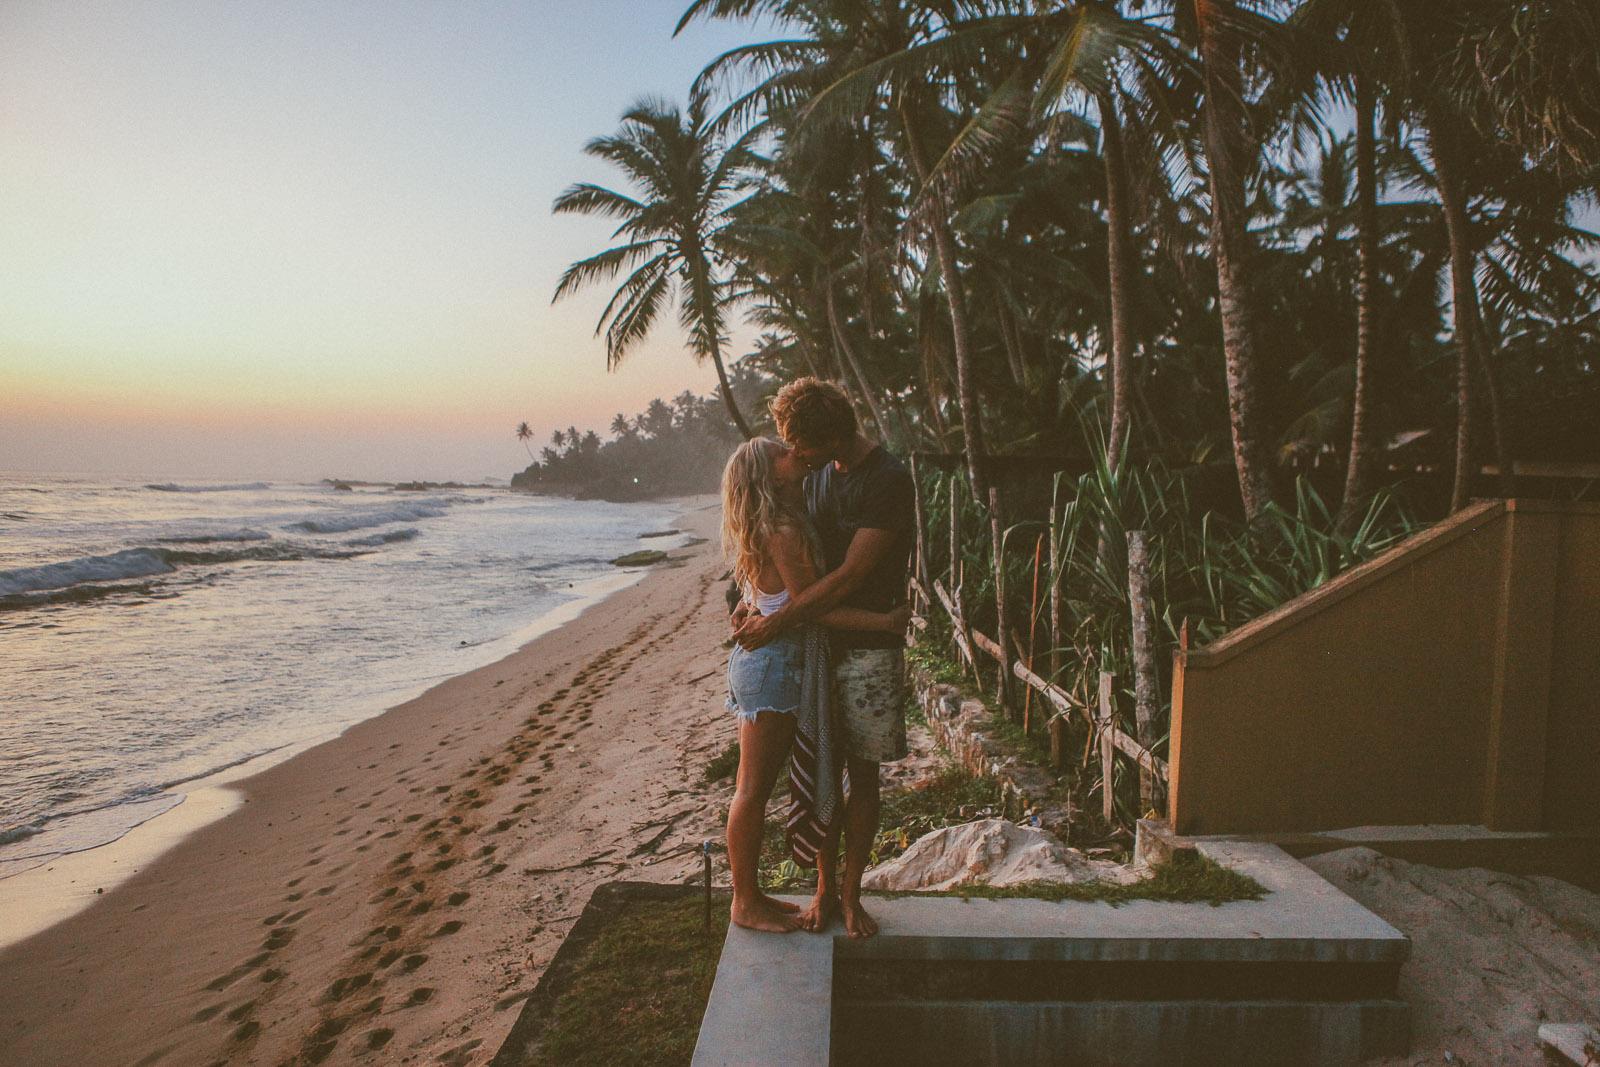 Sri Lanka-Hikkaduwa-Midigama-thalpe-era-beach-jetwing-surf-travel-blog-IMG_8820